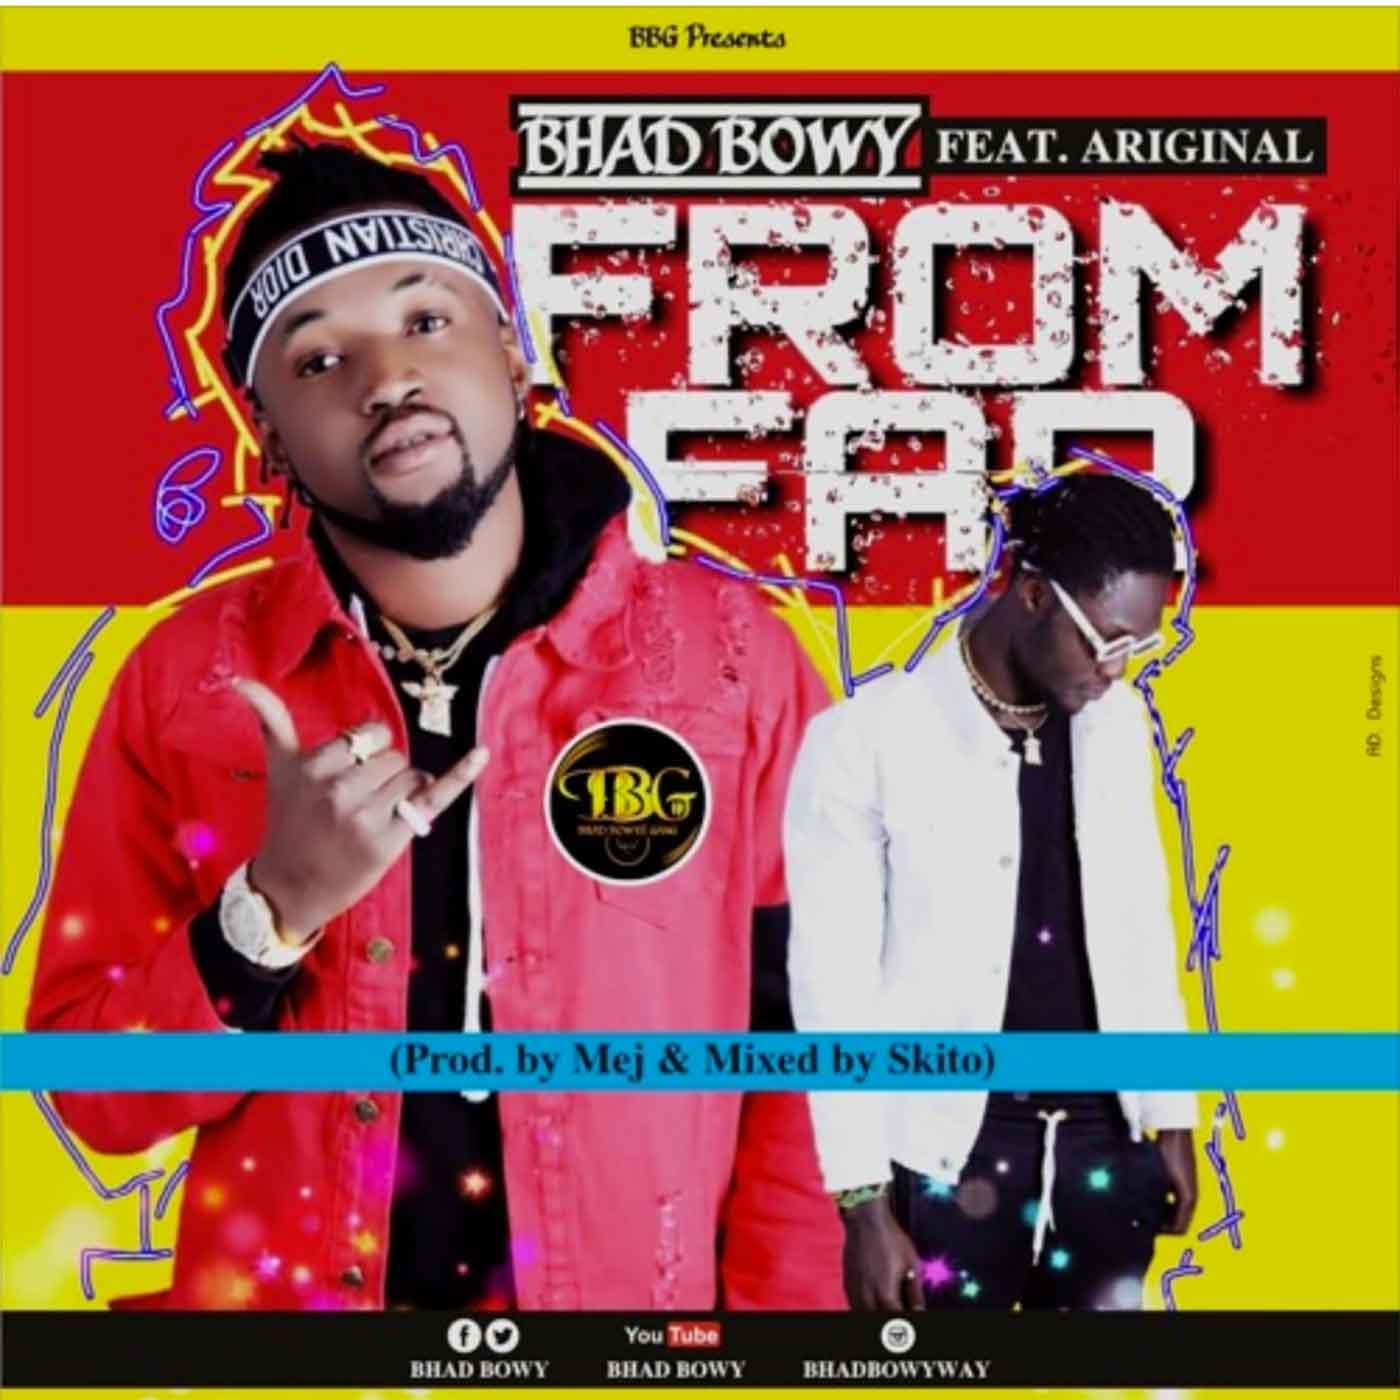 From Far by Bhad Bwoy feat. Ariginal